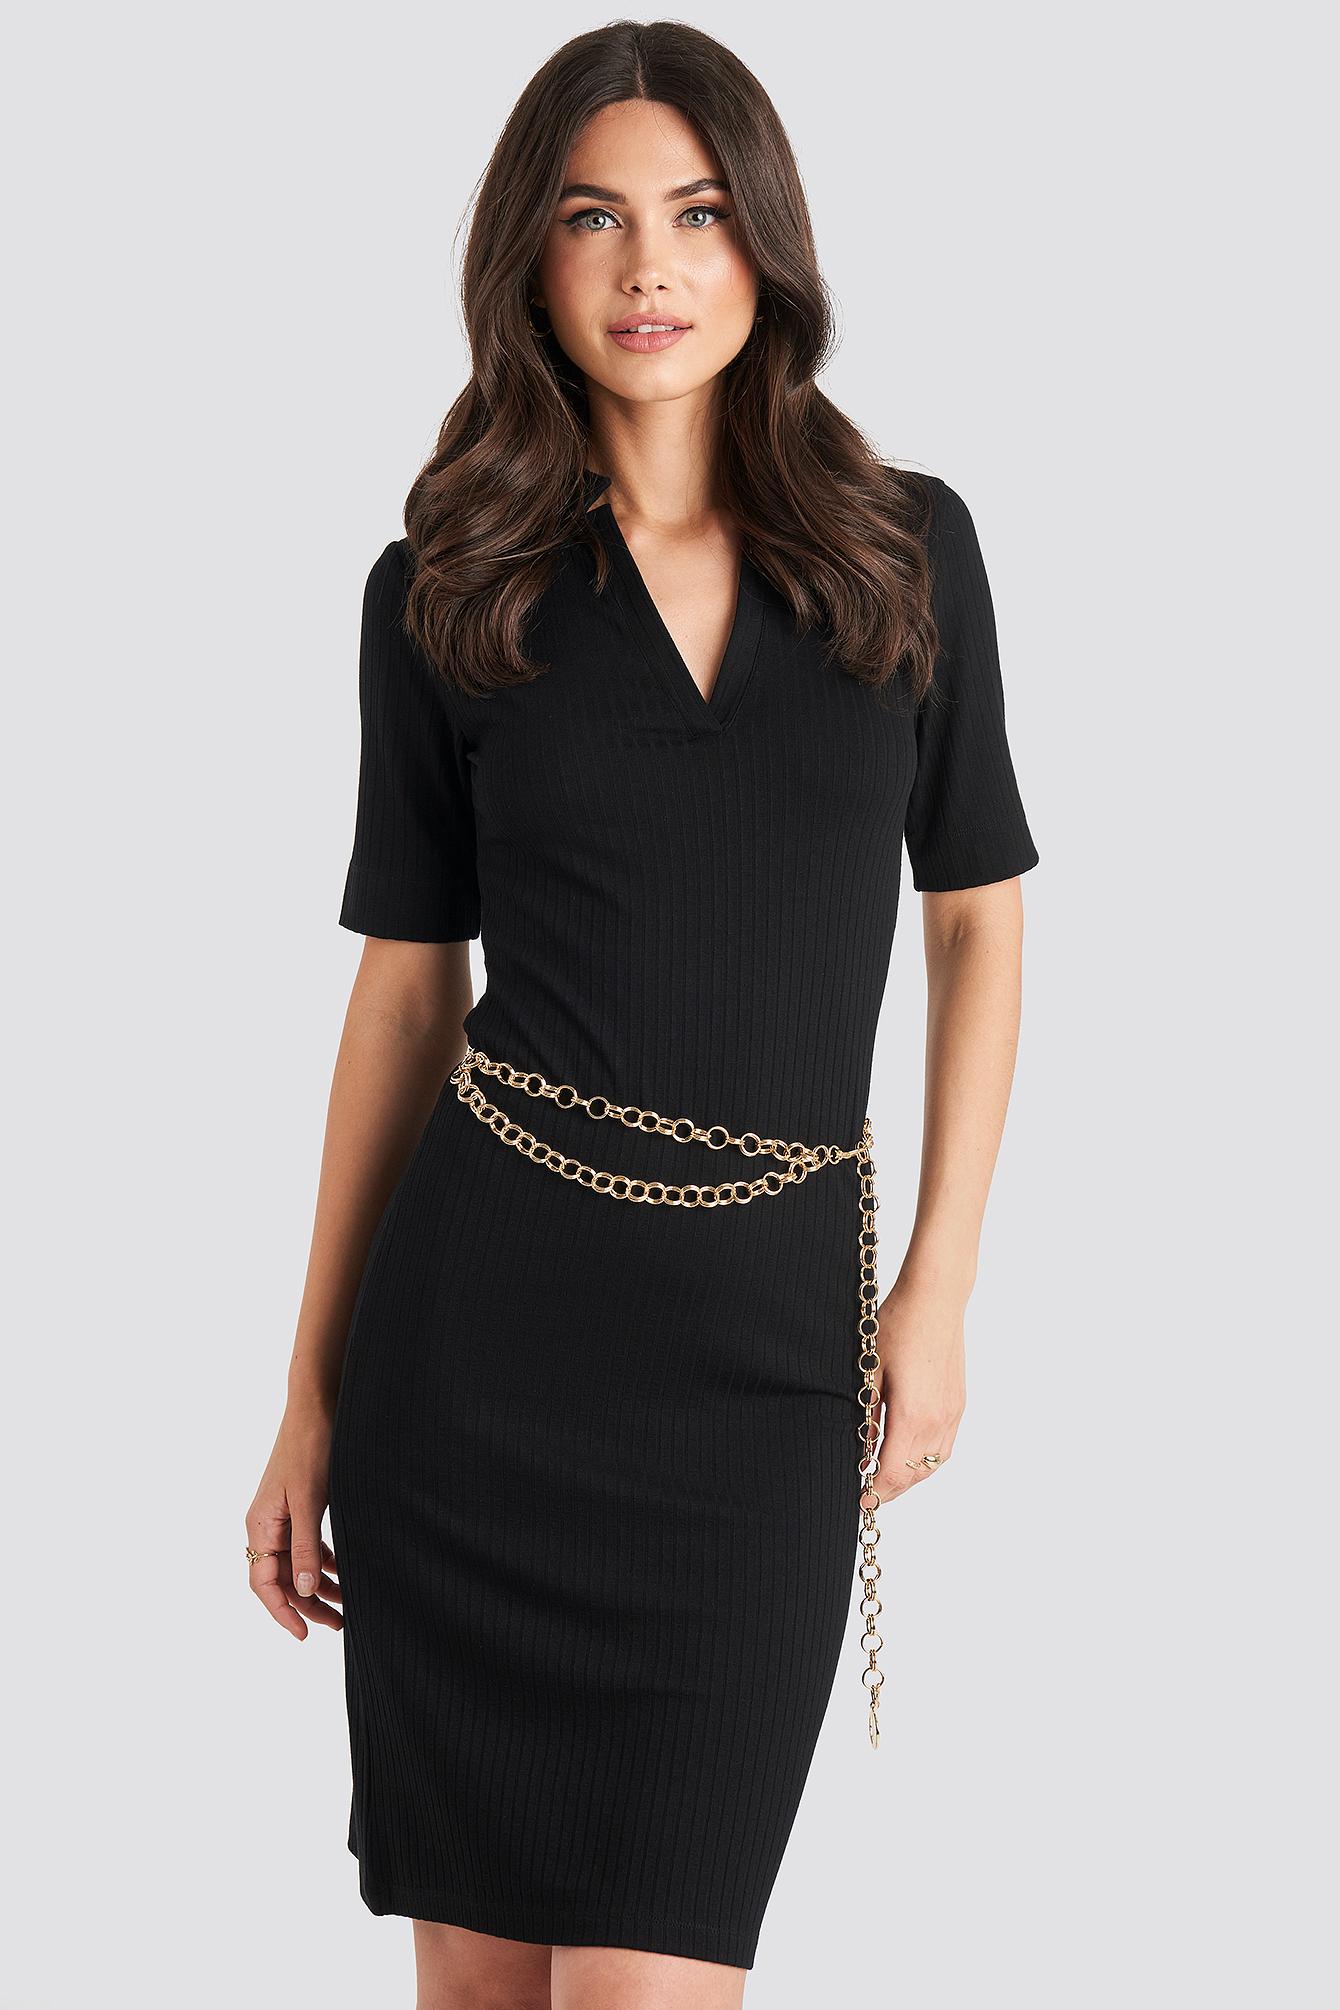 na-kd accessories -  Slim Links Chain Belt - Gold